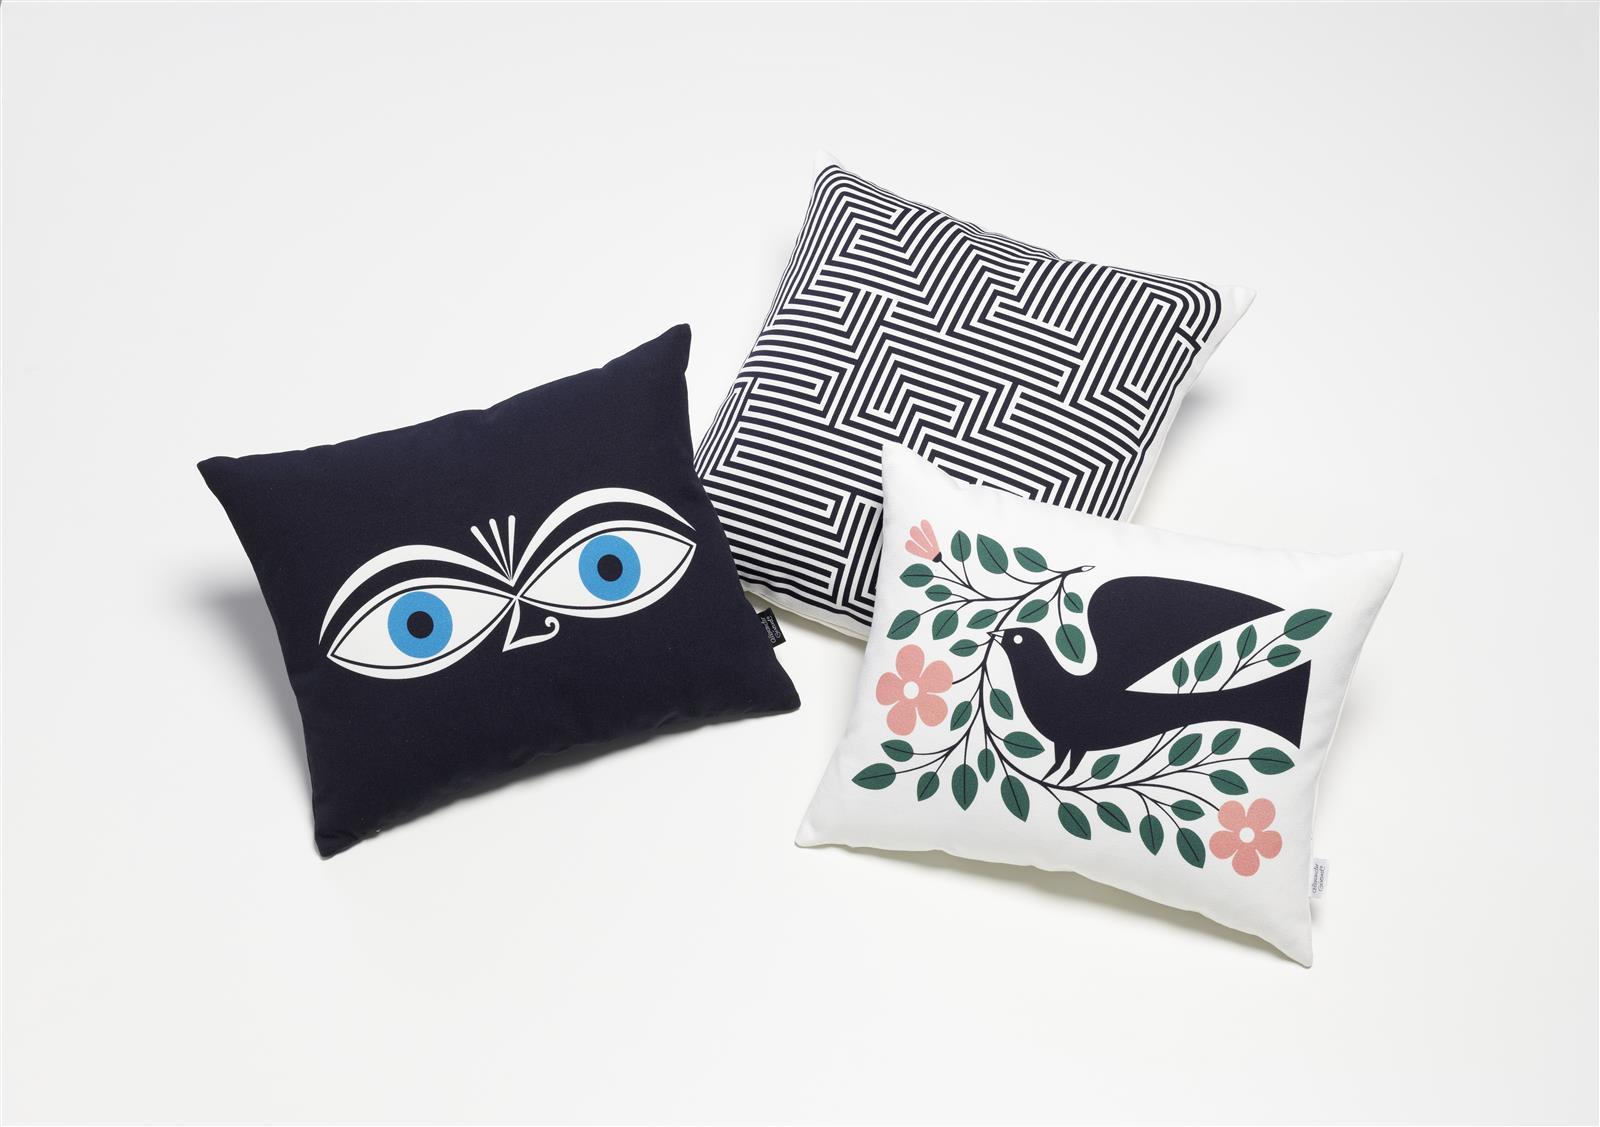 vitra kissen graphic print dove eur 79 00. Black Bedroom Furniture Sets. Home Design Ideas